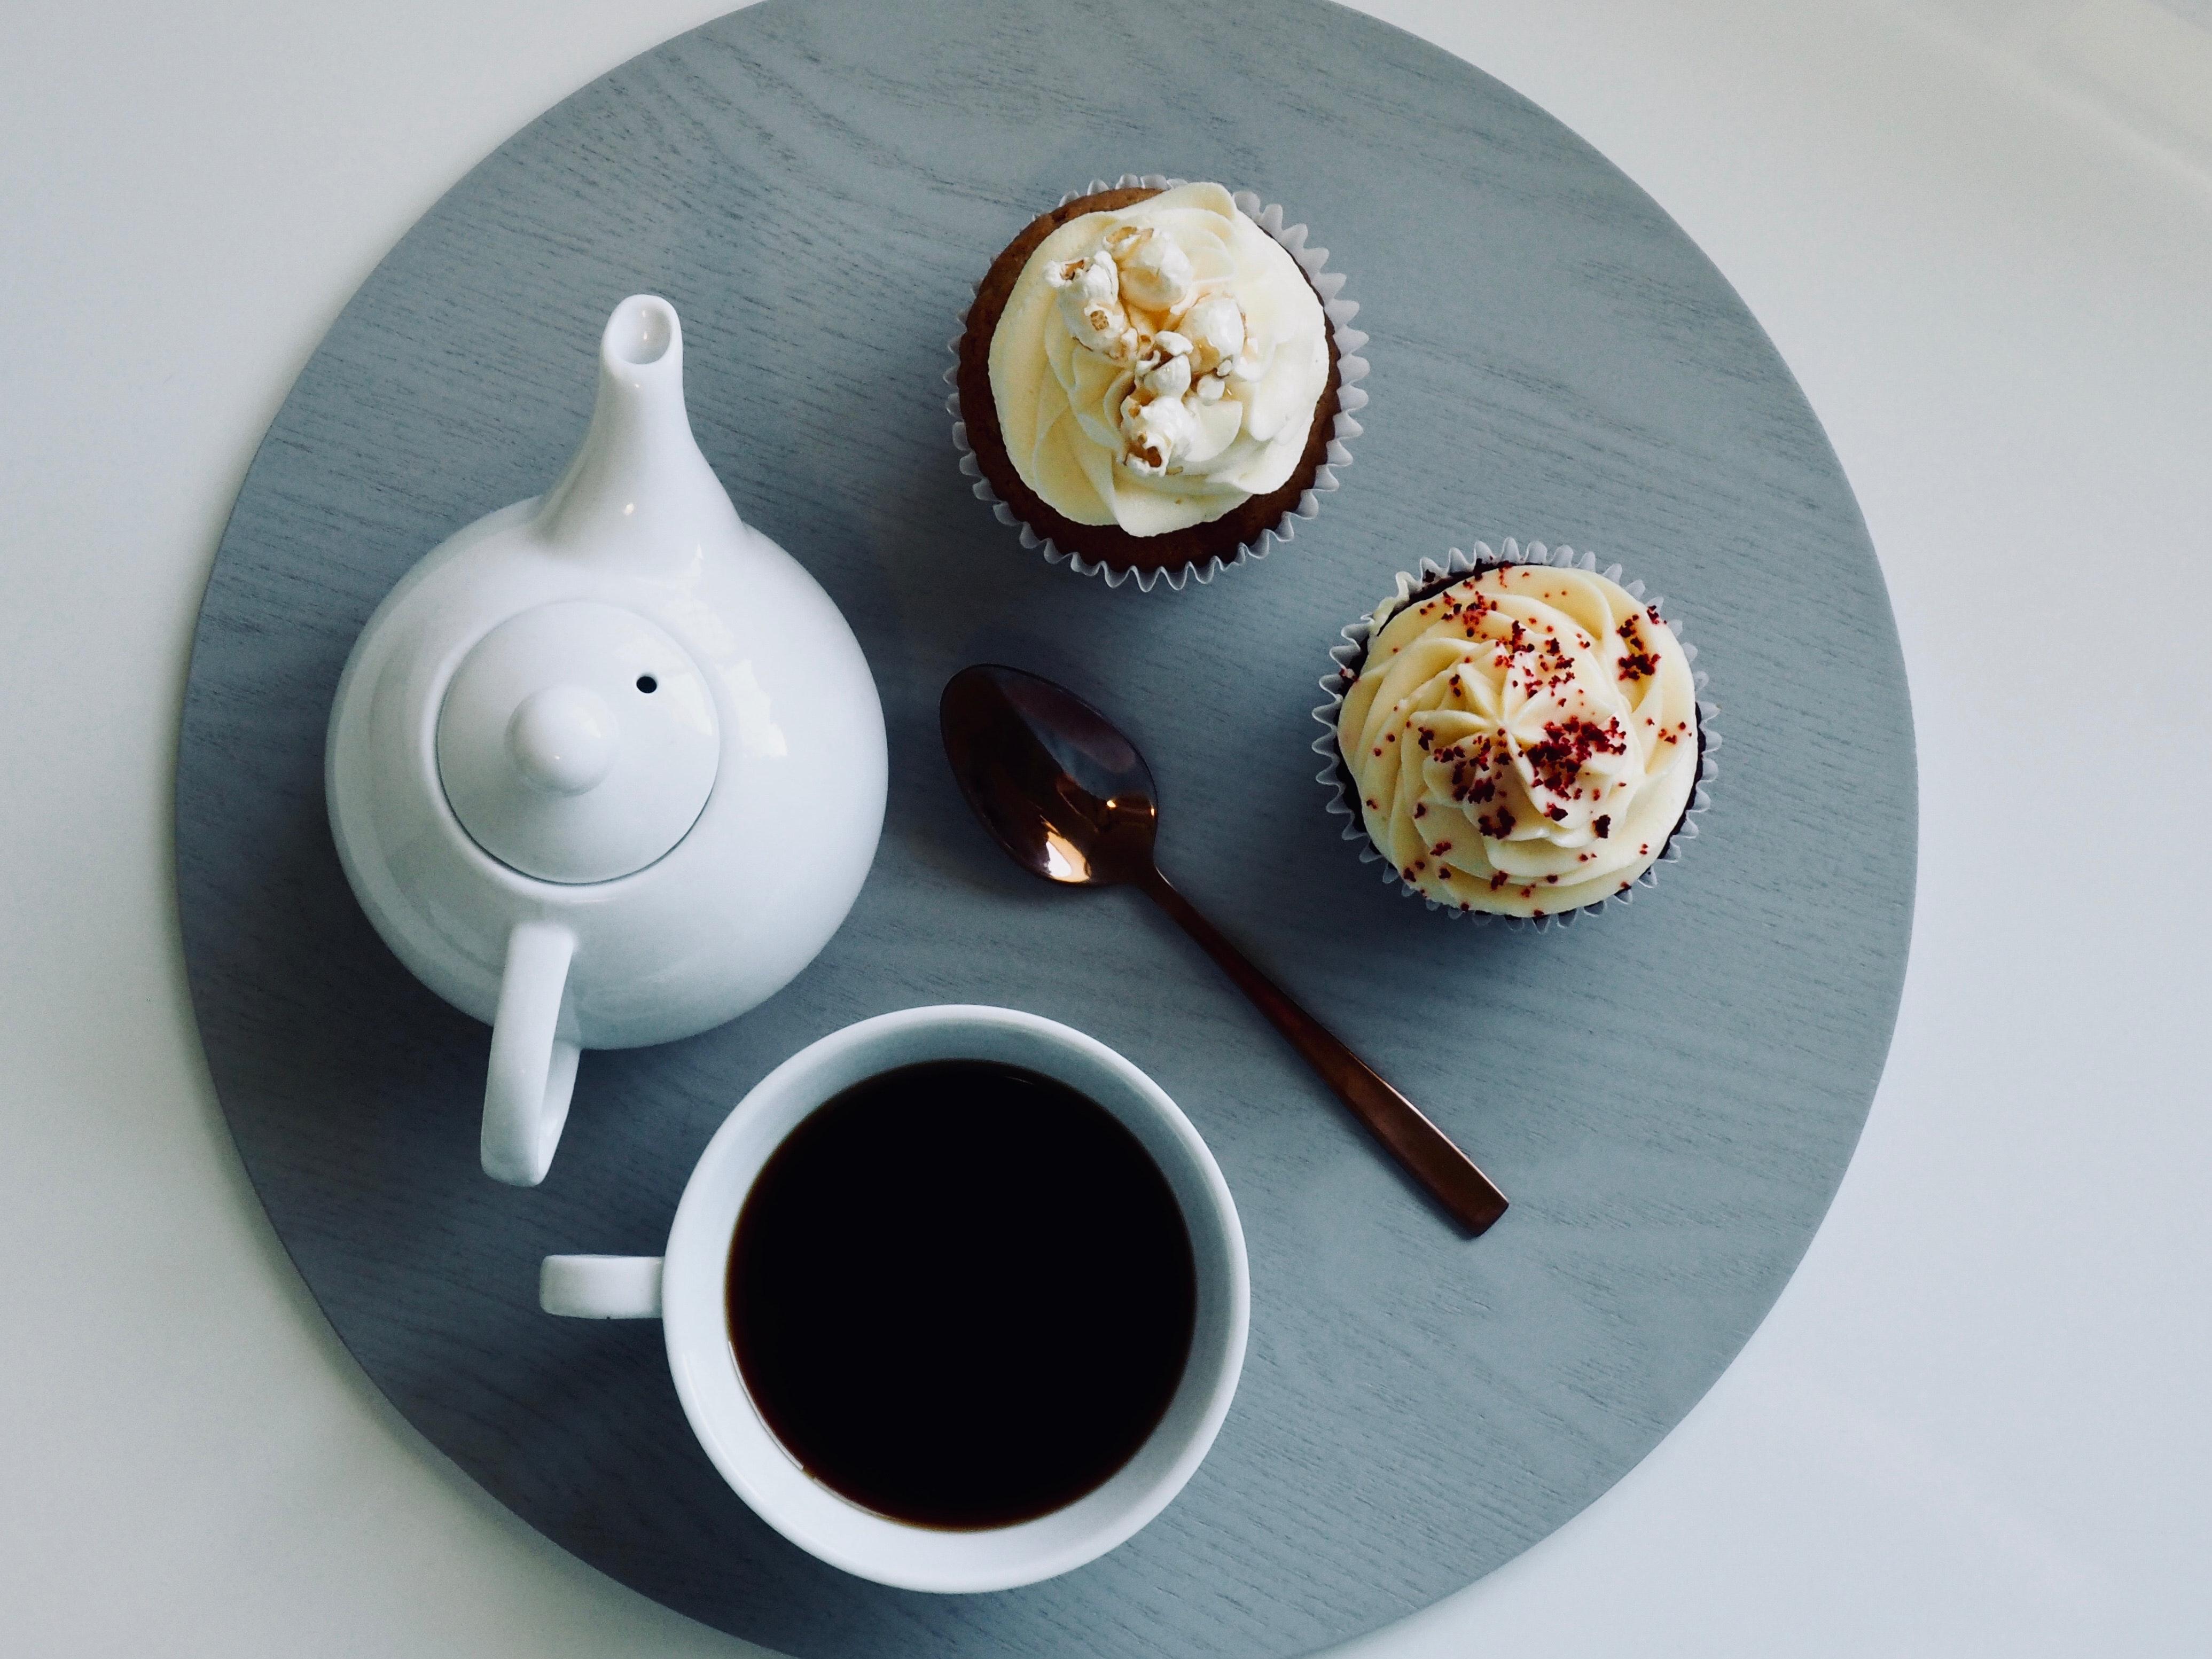 bake-baked-baking-913137